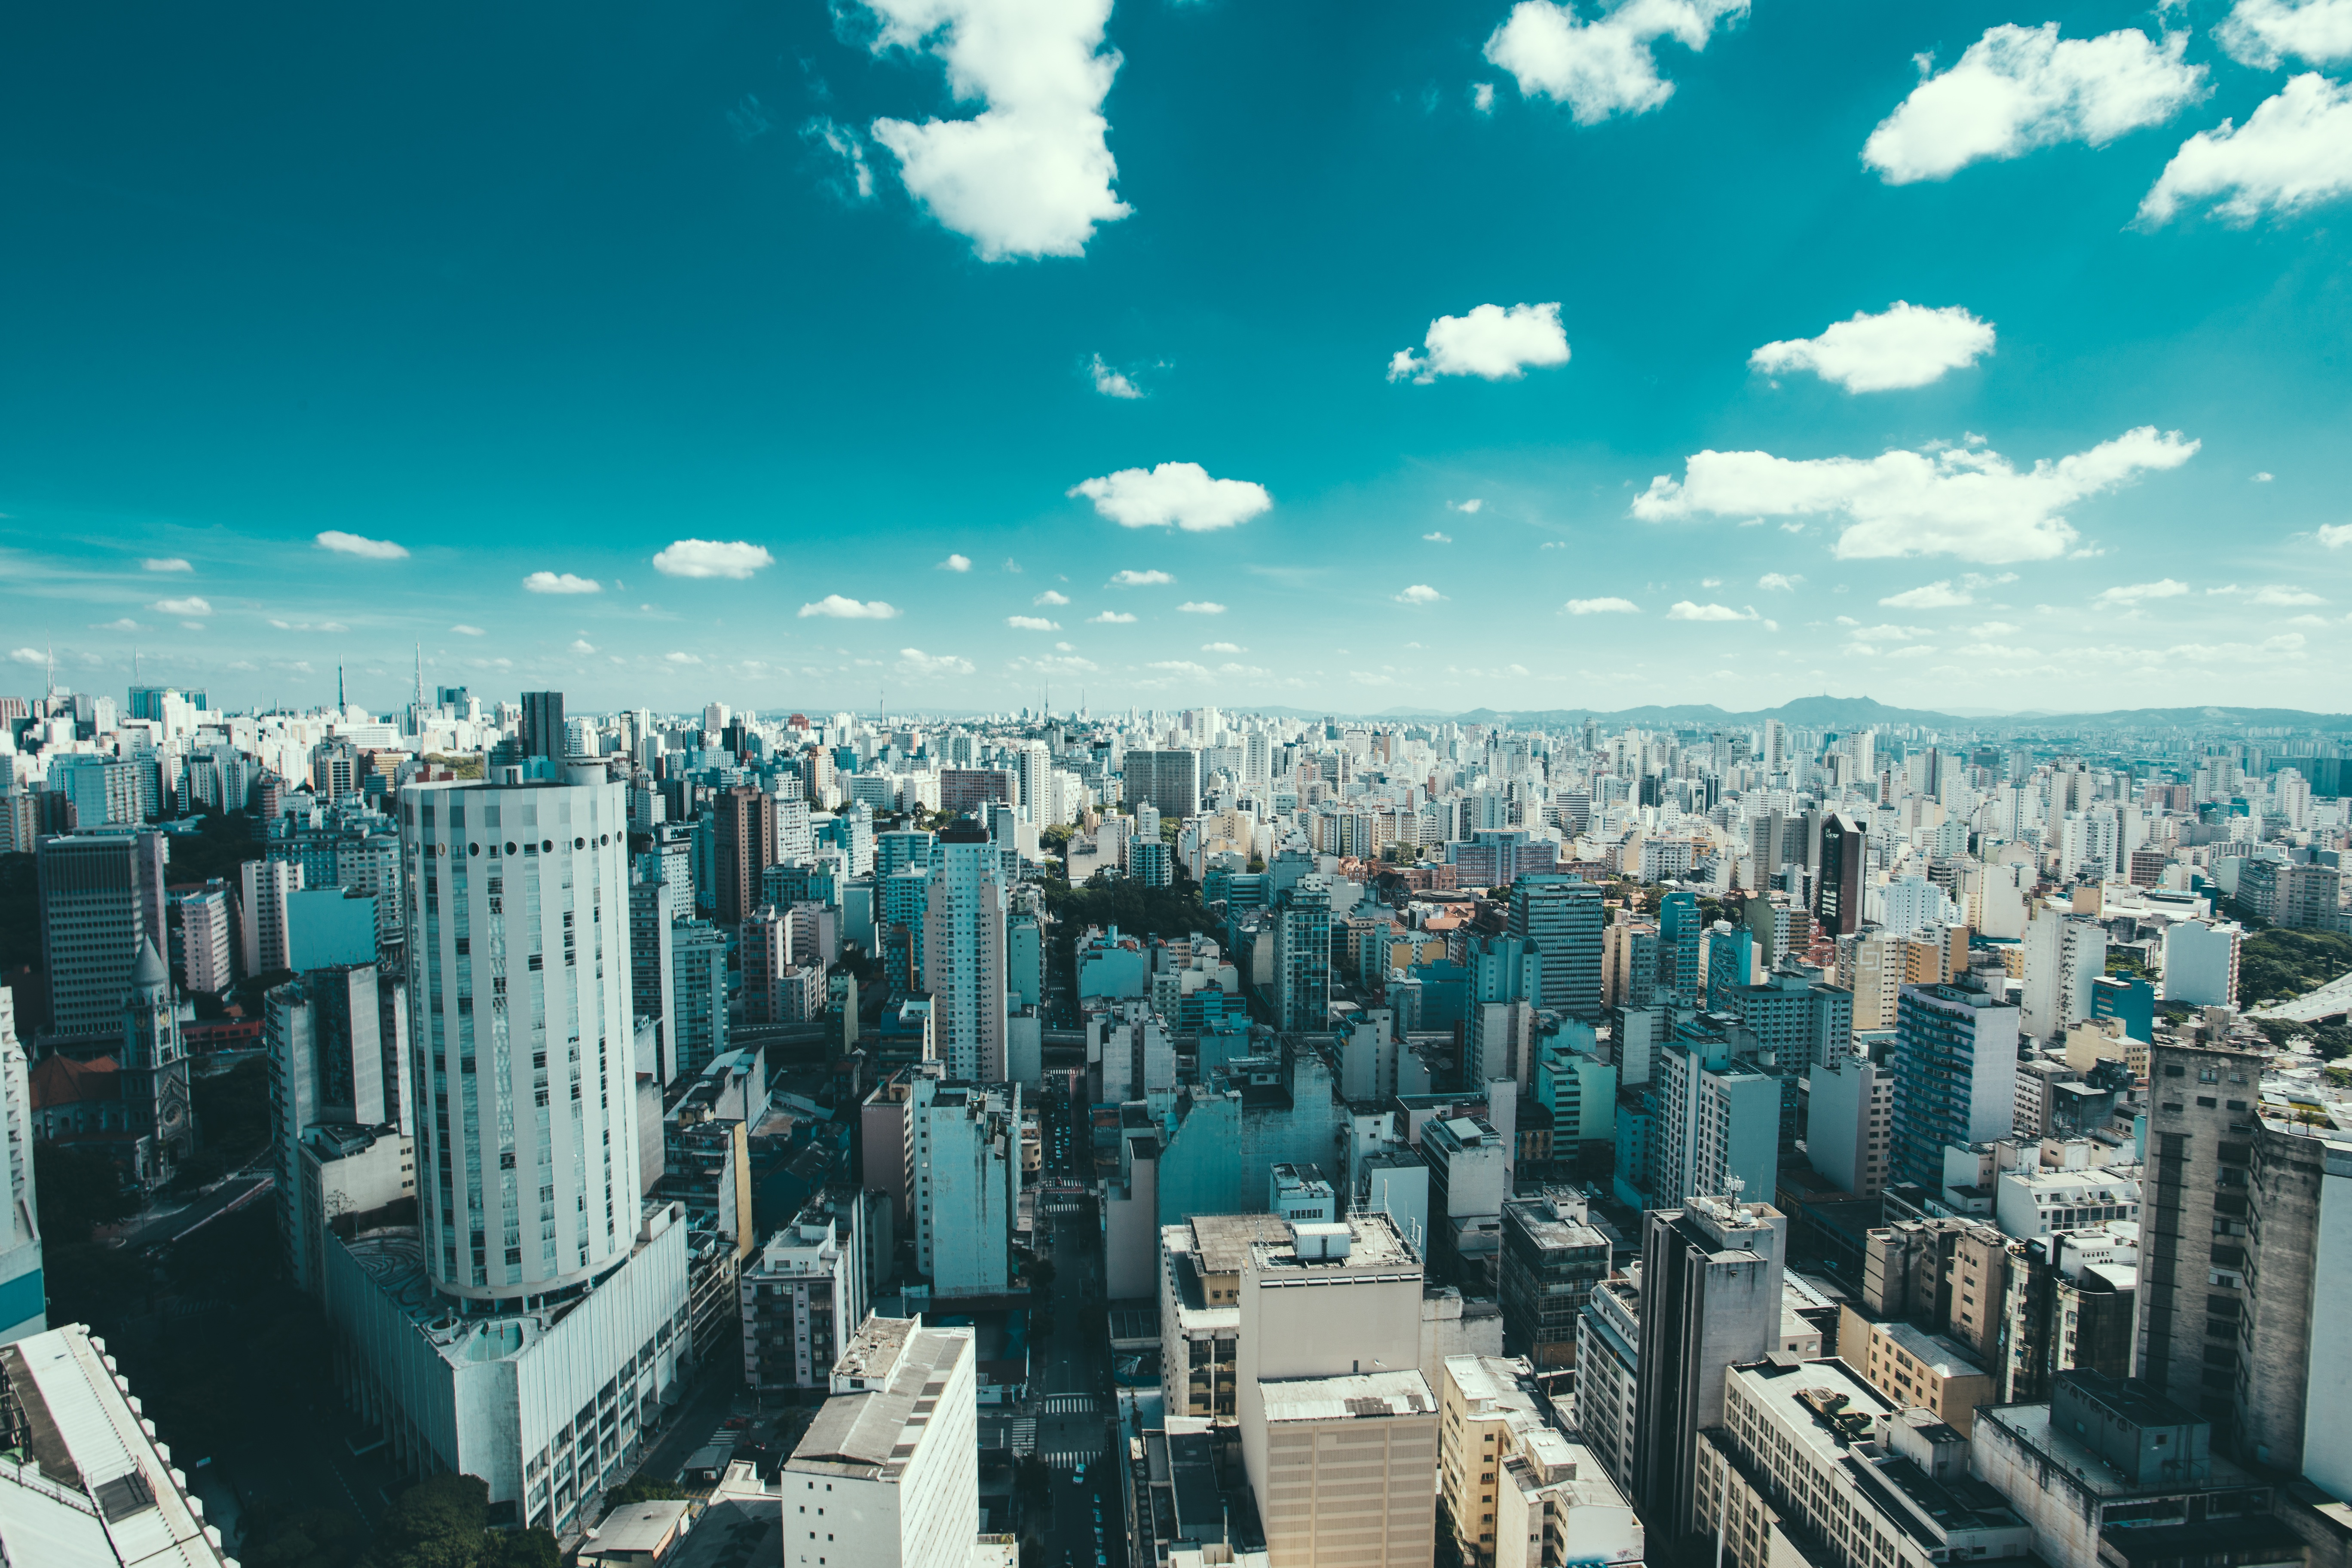 Serra Negra - São Paulo